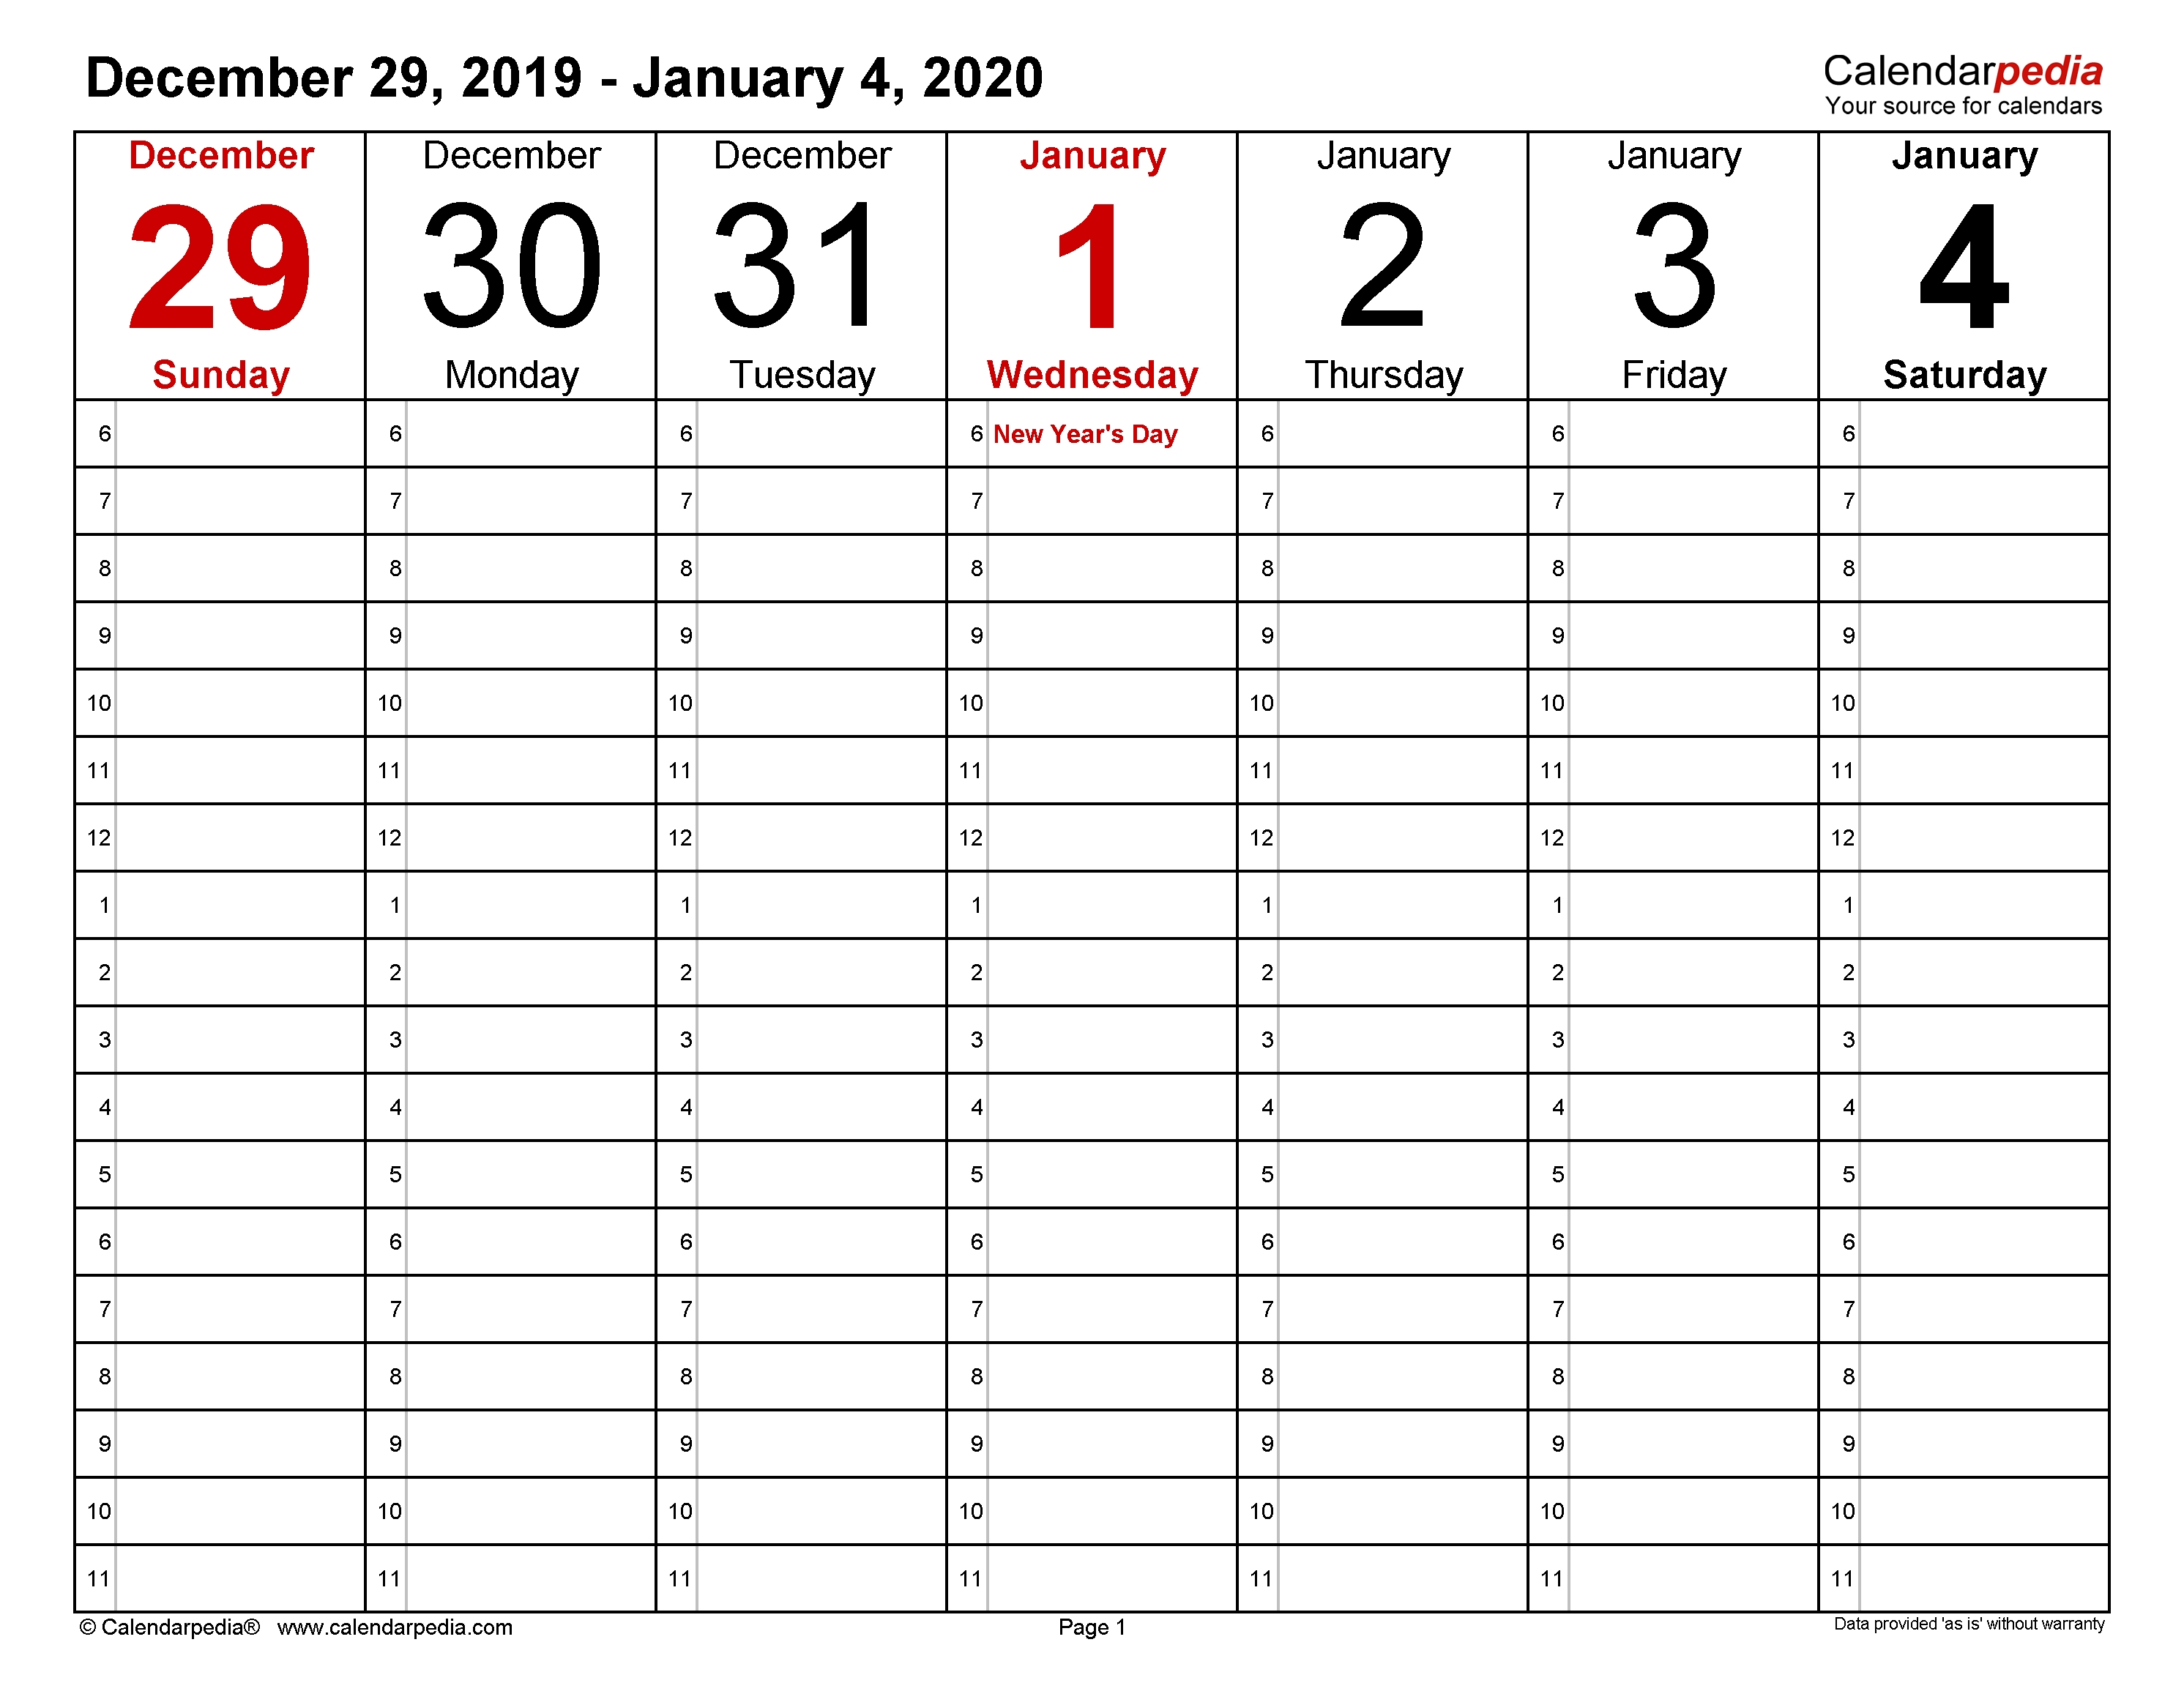 Weekly Calendars 2020 For Pdf - 12 Free Printable Templates 3 Week Calendar Template